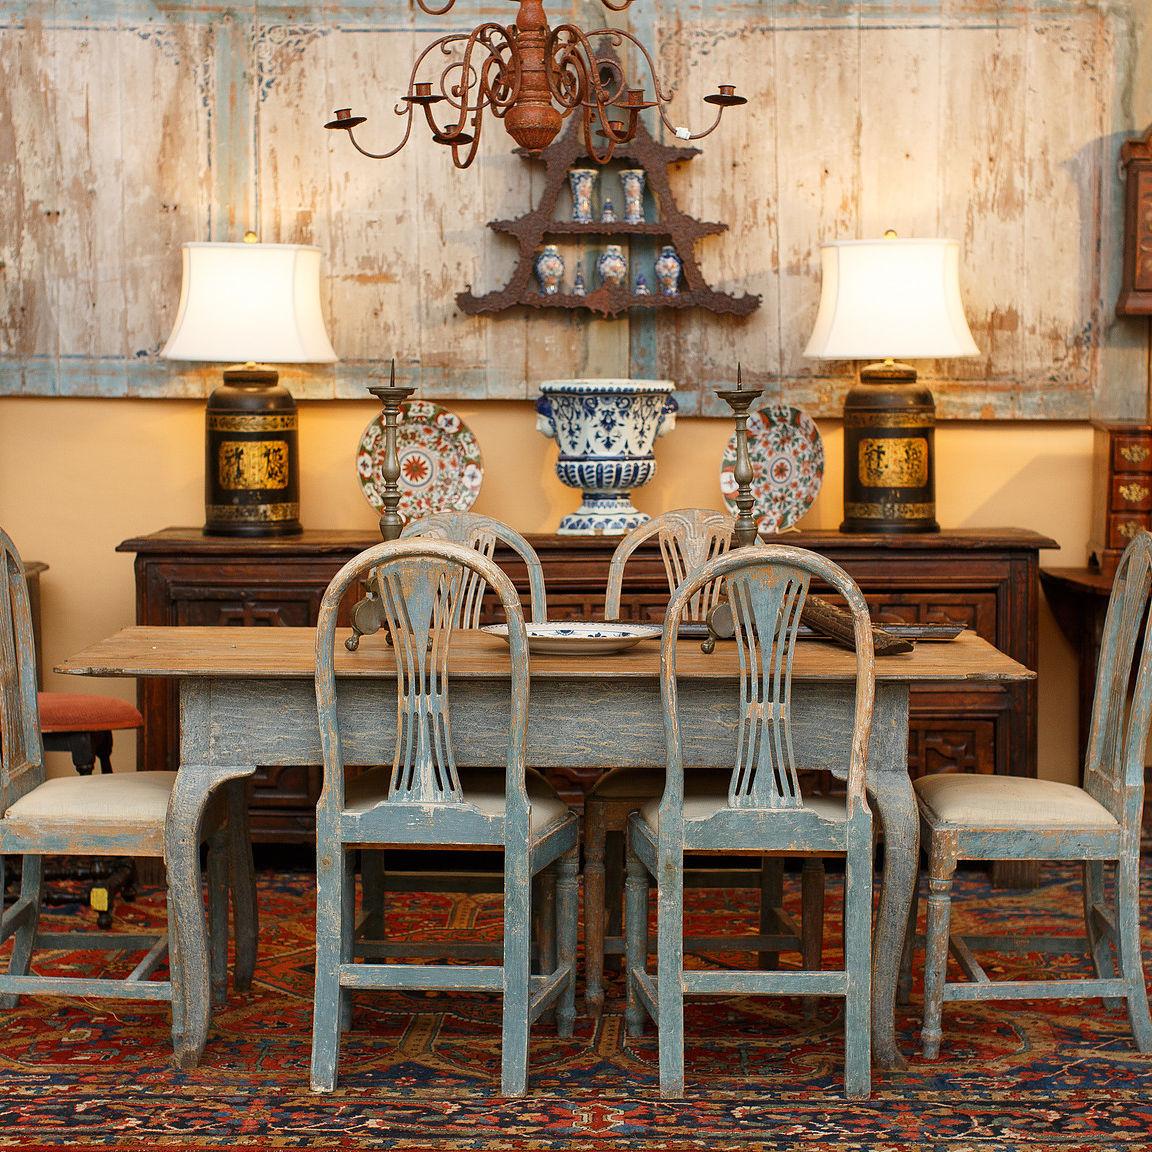 Co the original round top antiques fair 1 t8xfmr